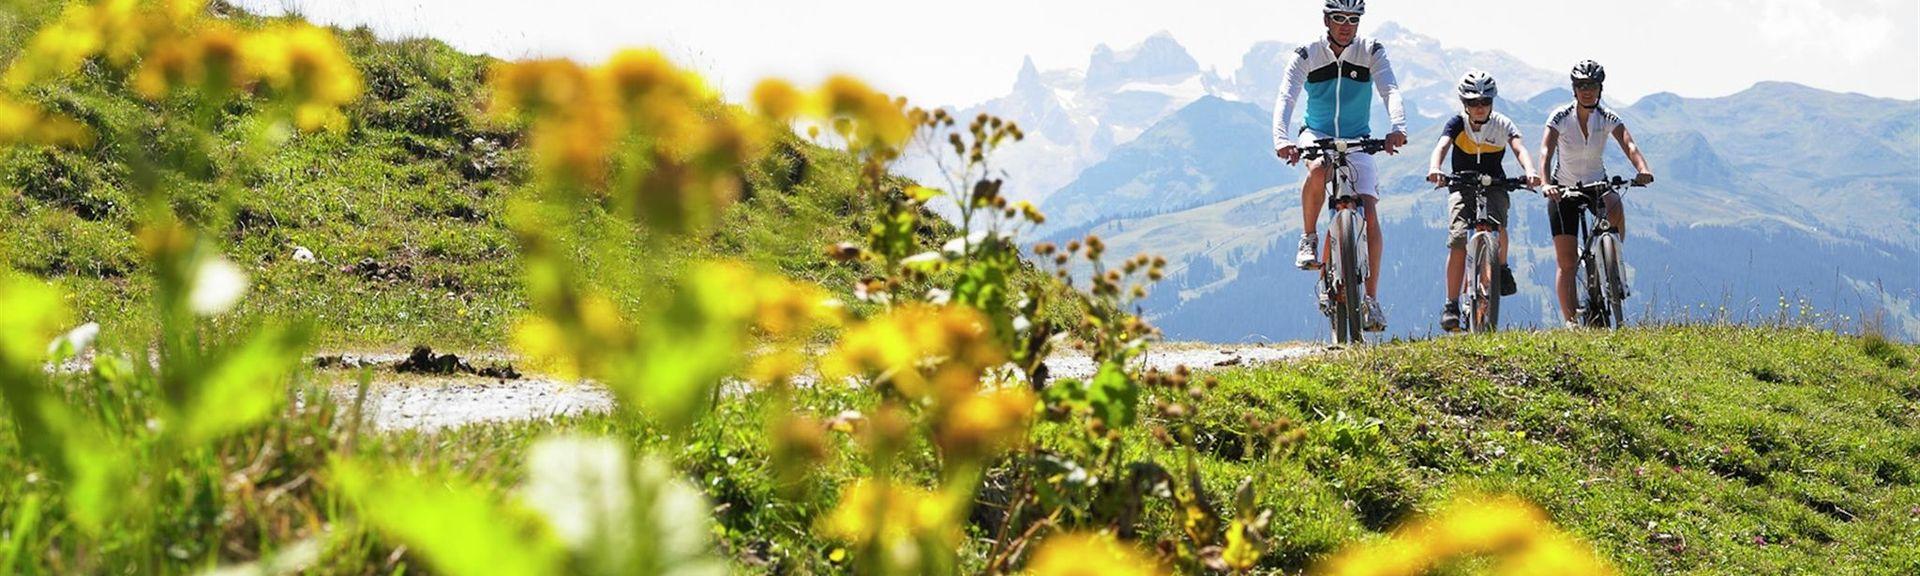 Sankt Anton im Montafon, Vorarlberg, Austria